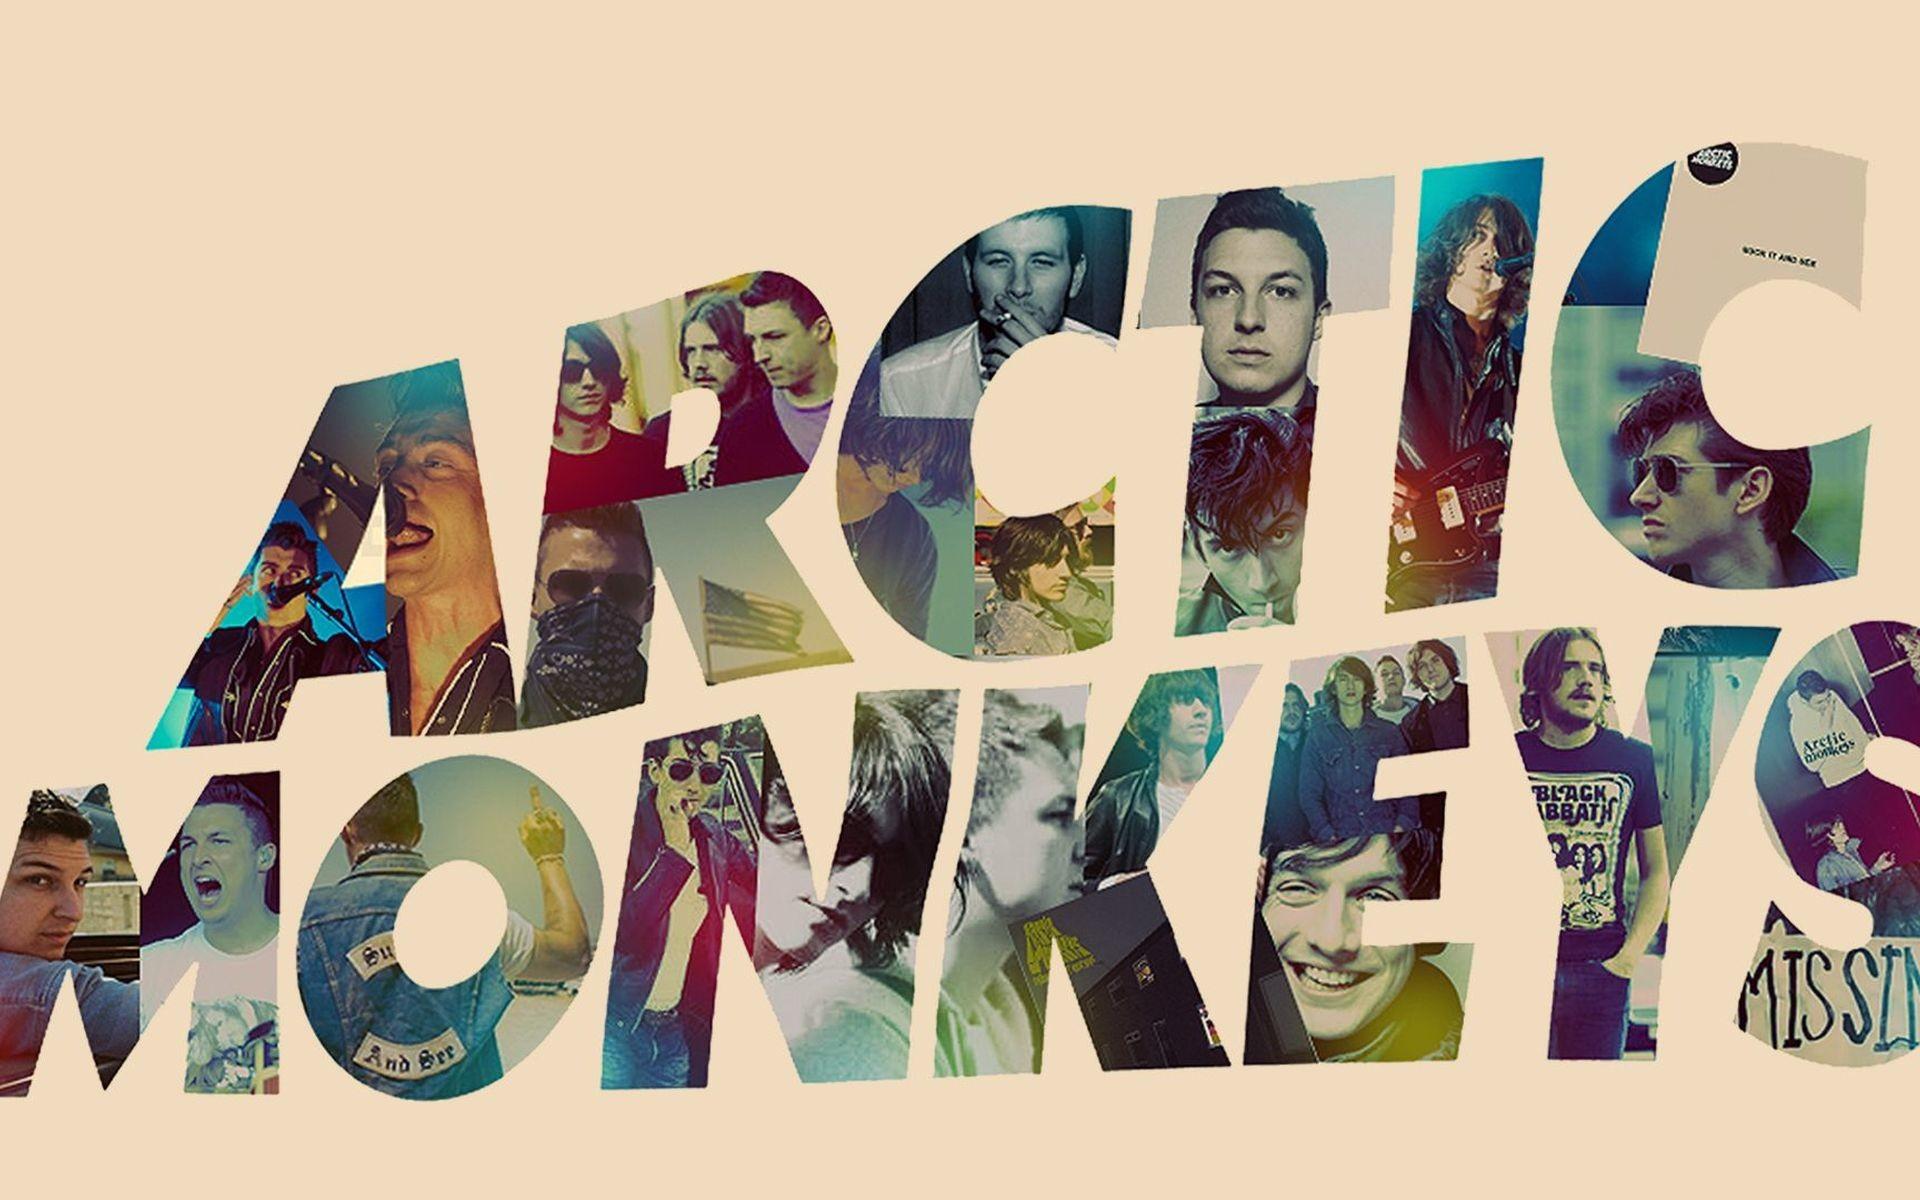 Arctic Monkeys Wallpaper Hd 75 Images